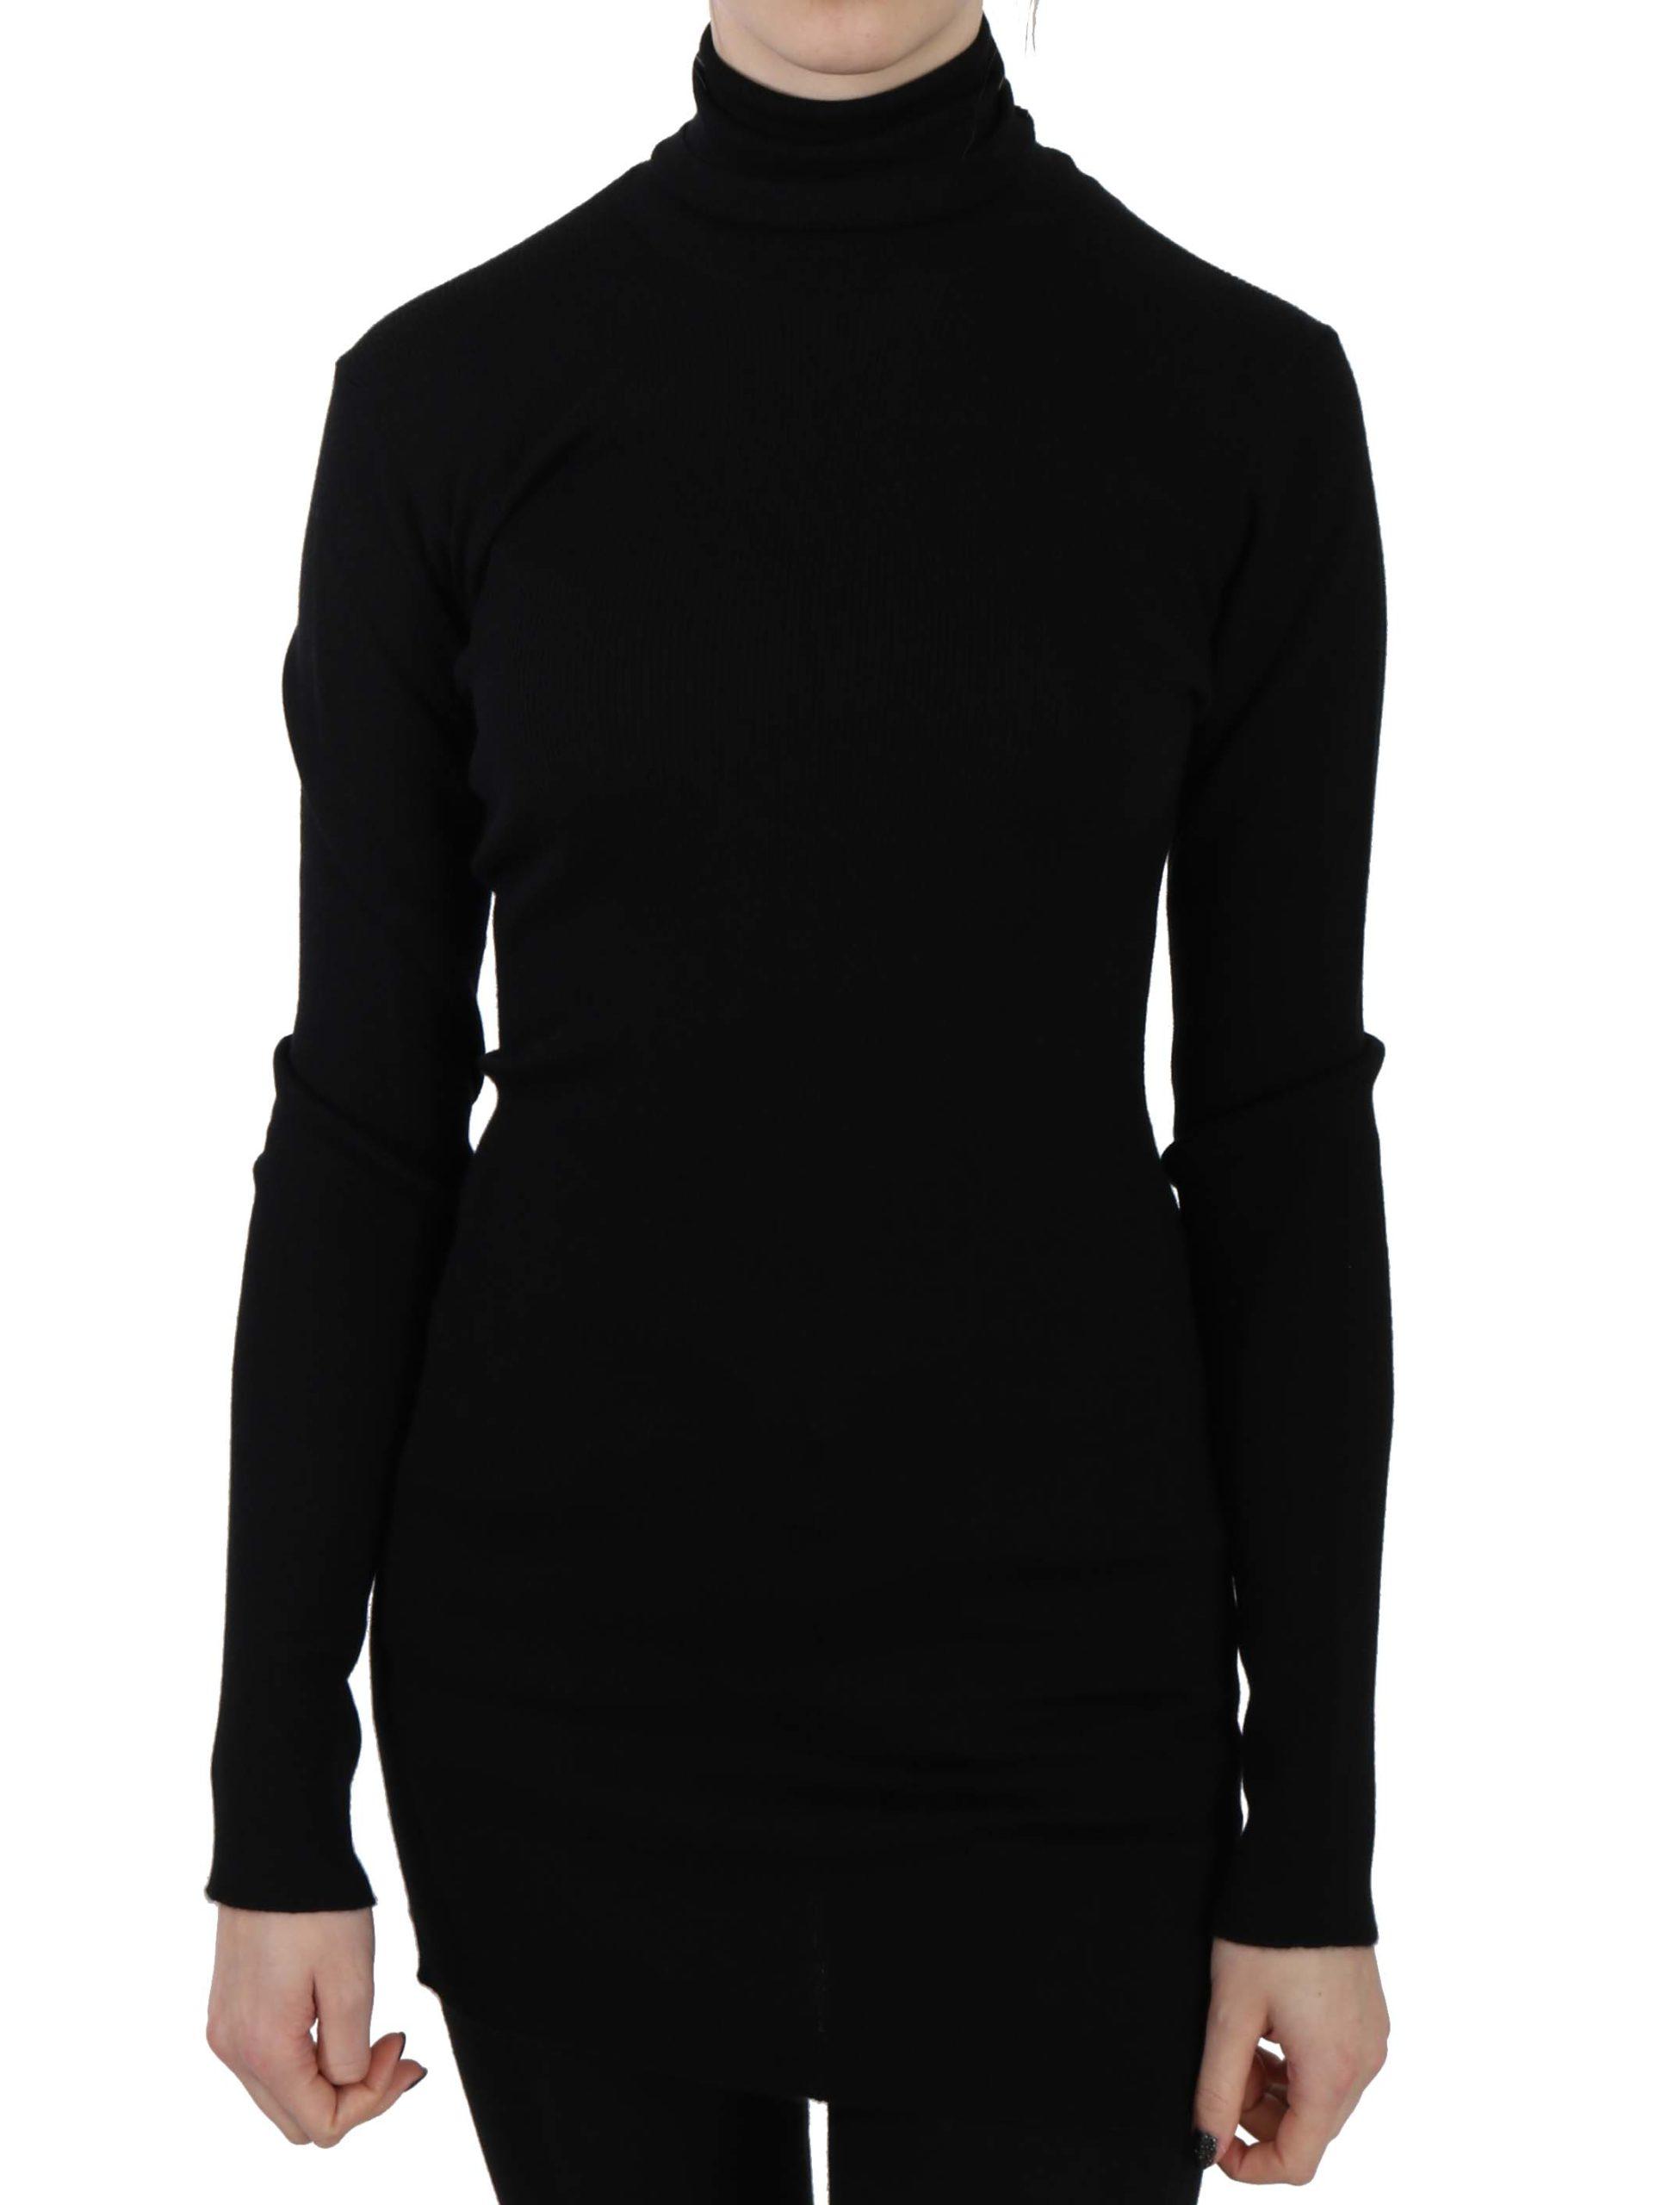 Dolce & Gabbana Women's Cashmere Turtle Neck Pullover Top Sweater Black TSH3253 - IT46|XL